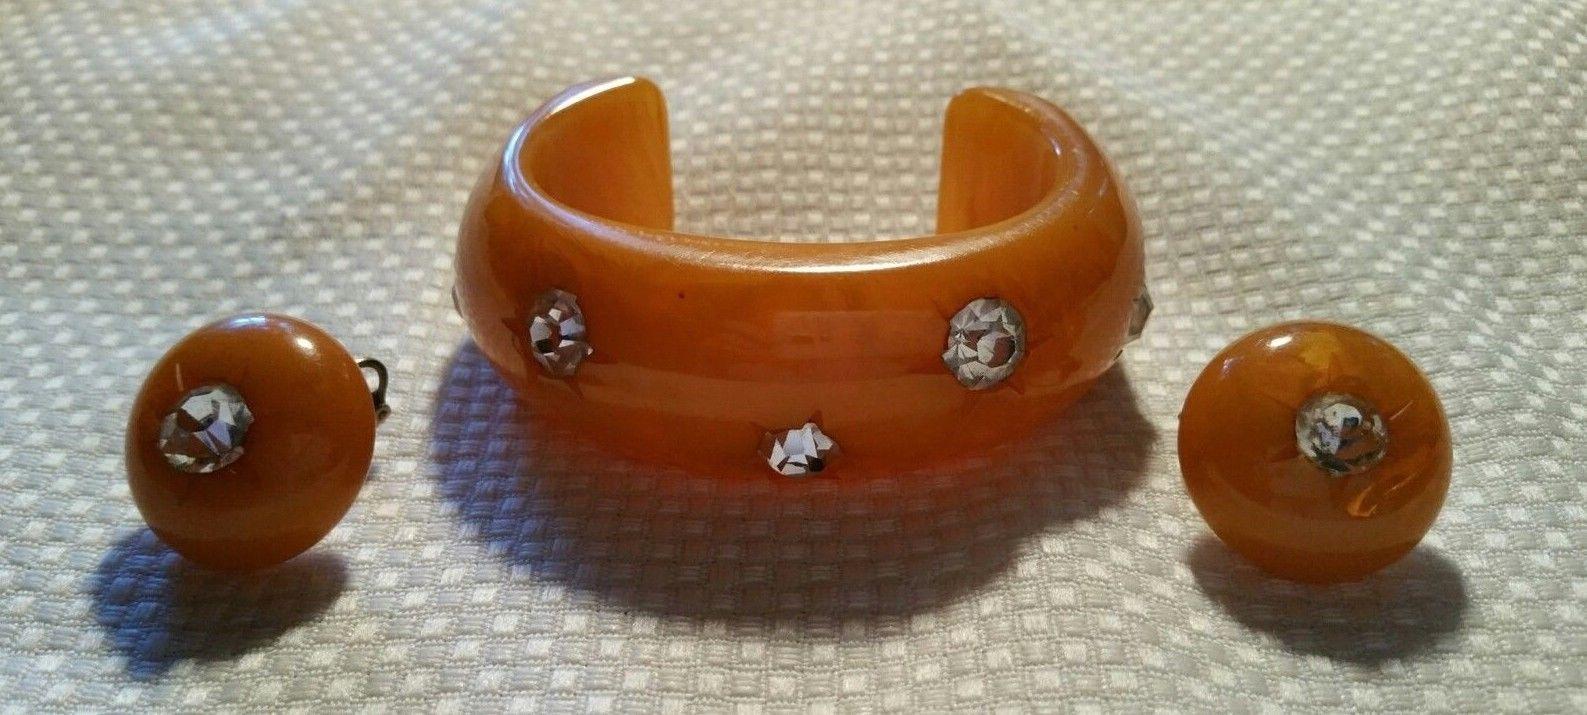 Vintage Bakelite with Insert Rhinestones Oval Cuff Bangle Bracelet and Earrings